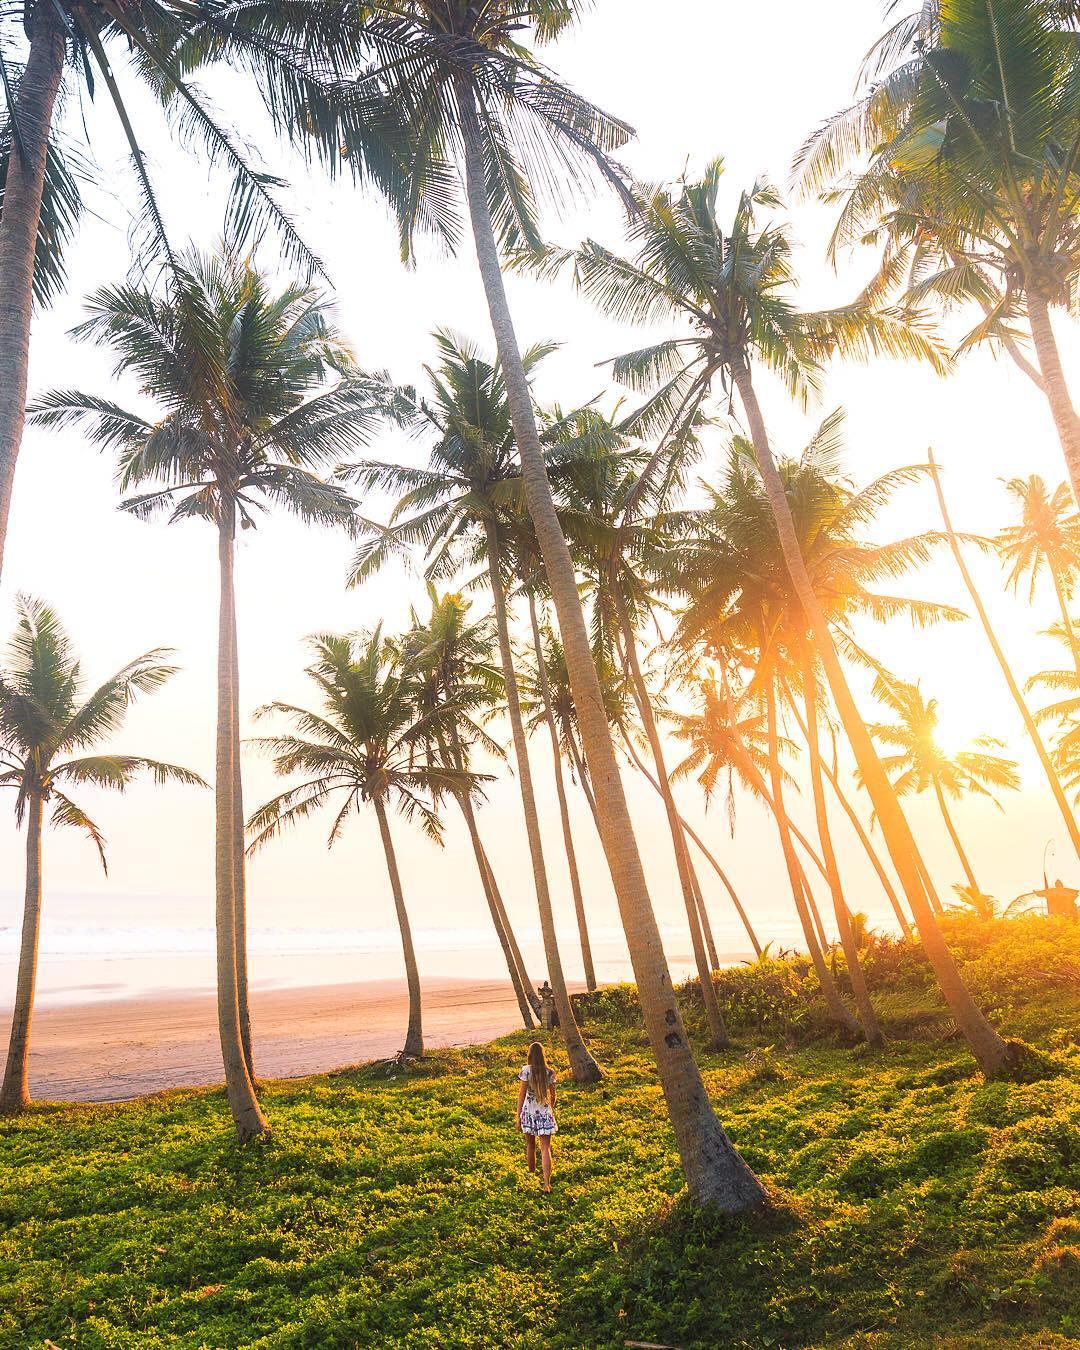 Топ-10 мест на Бали - пляж Пасут